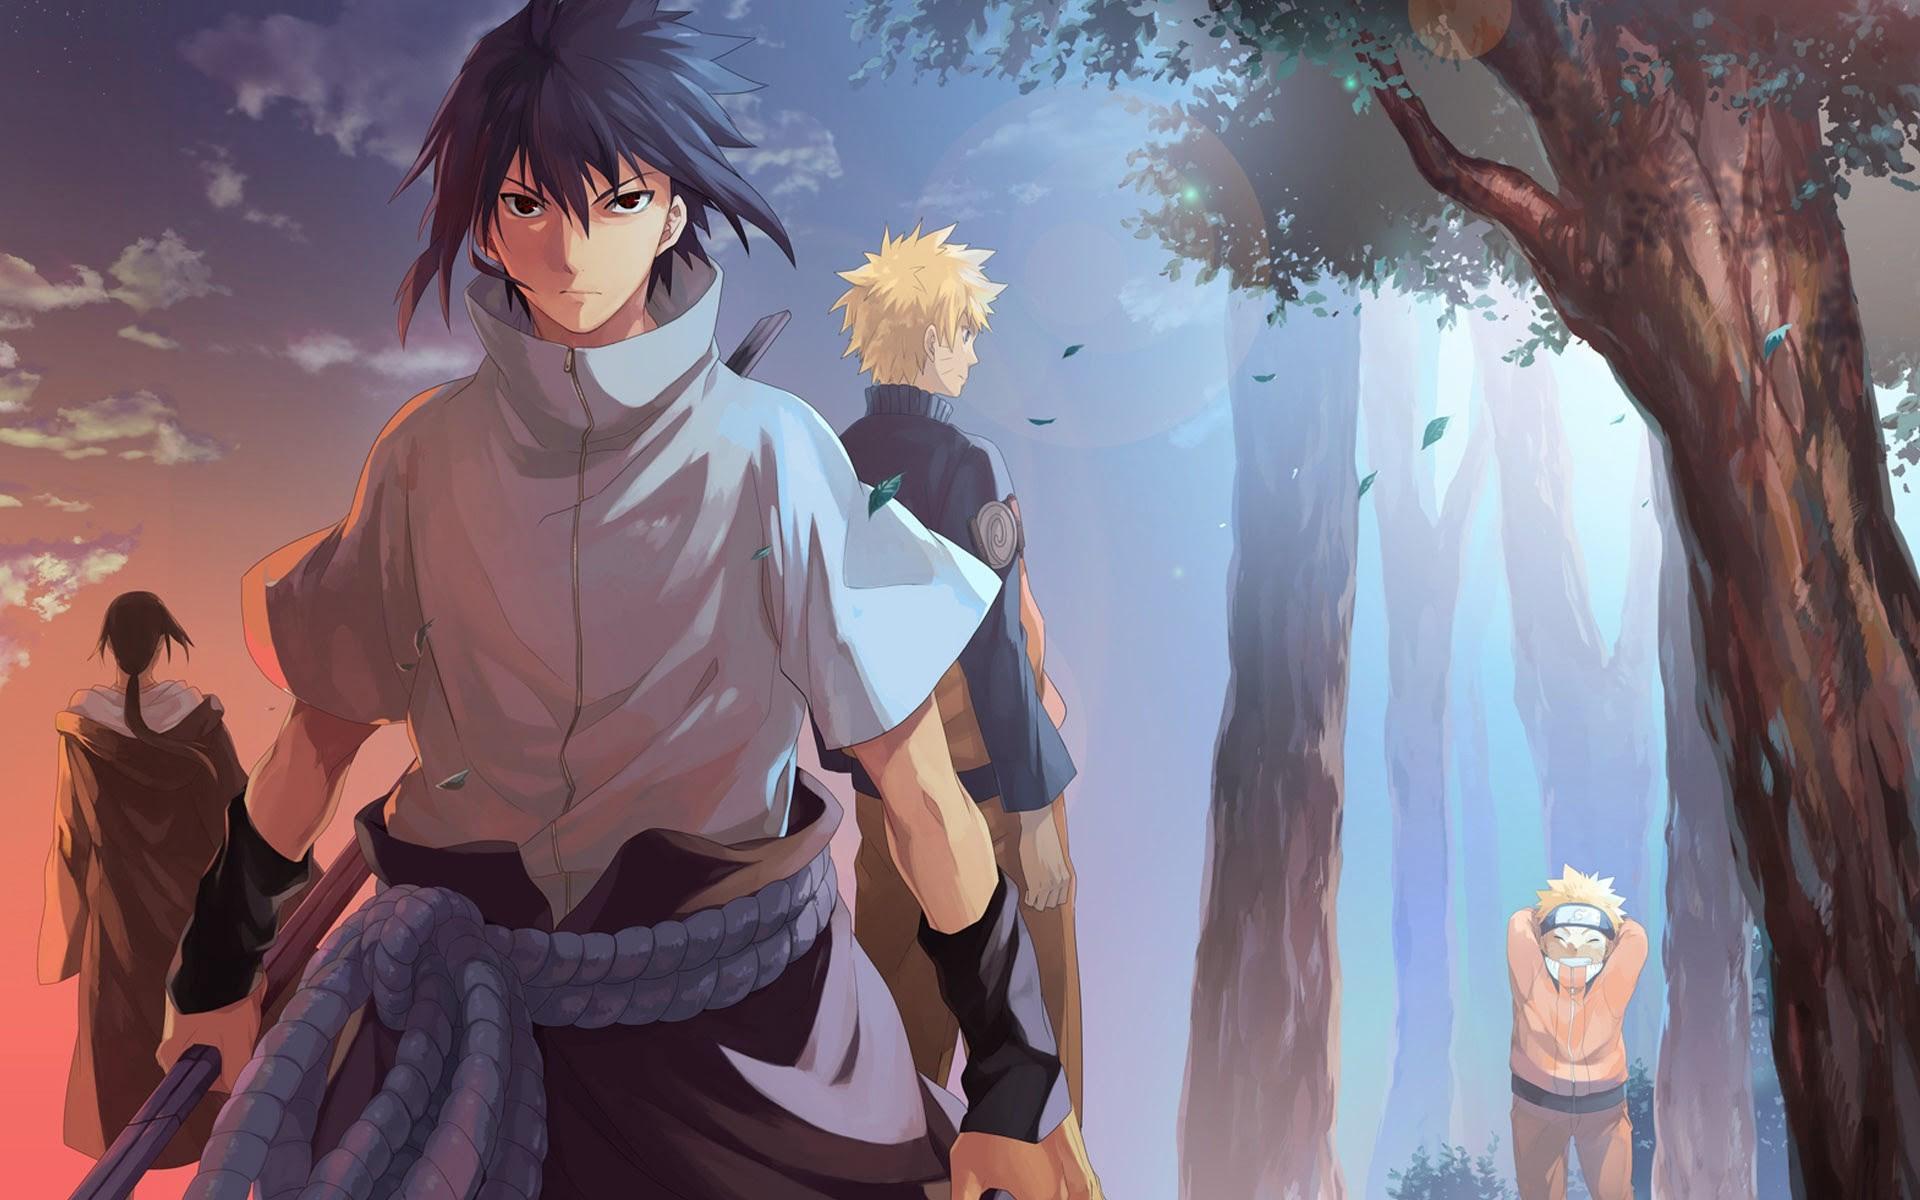 Sasuke And Itachi Wallpaper Hd 62 Images